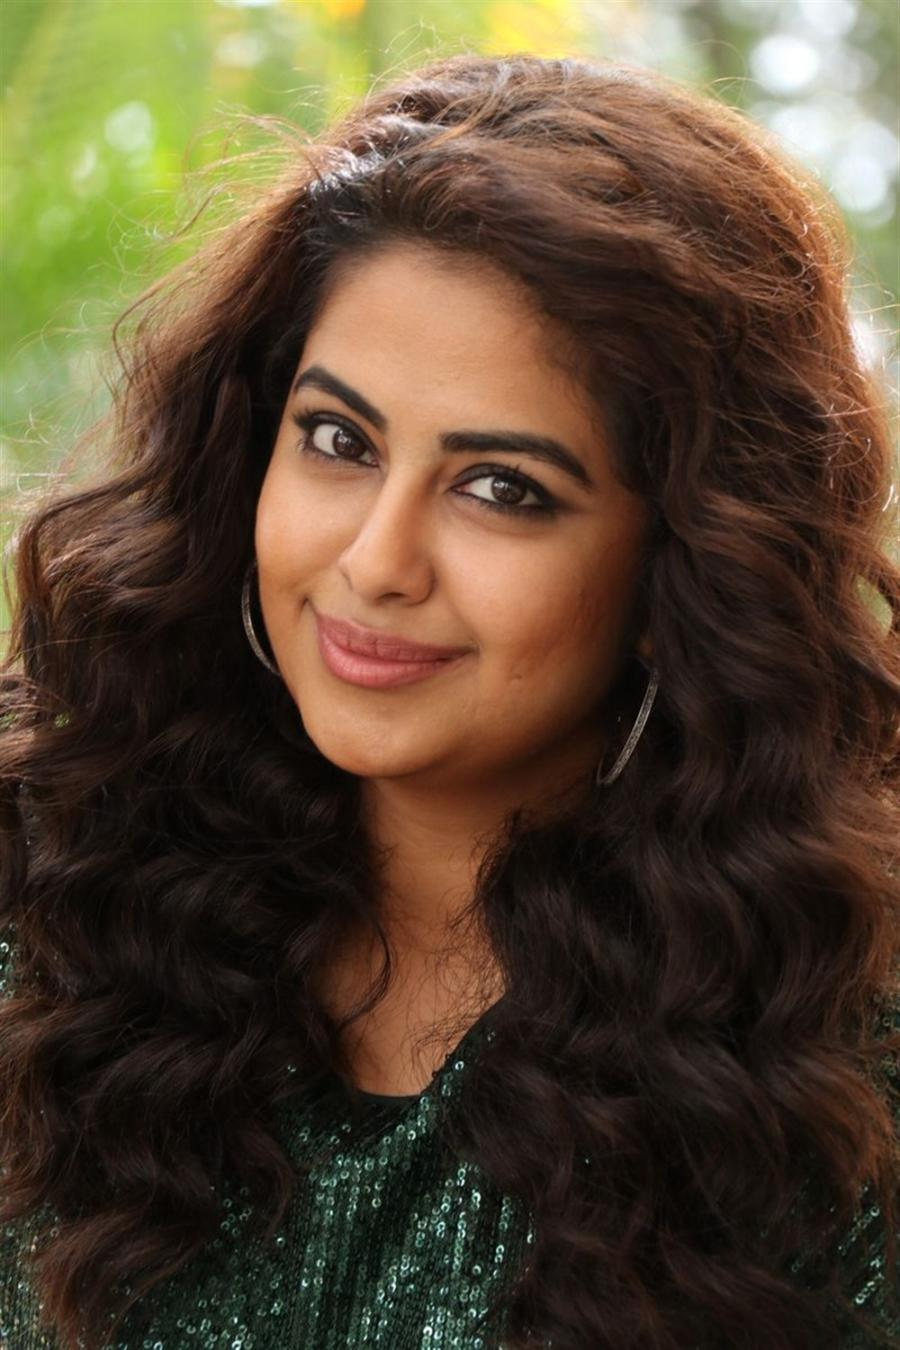 Telugu Actress Avika Gor at Raju Gari Gadhi 3 Movie Promotion